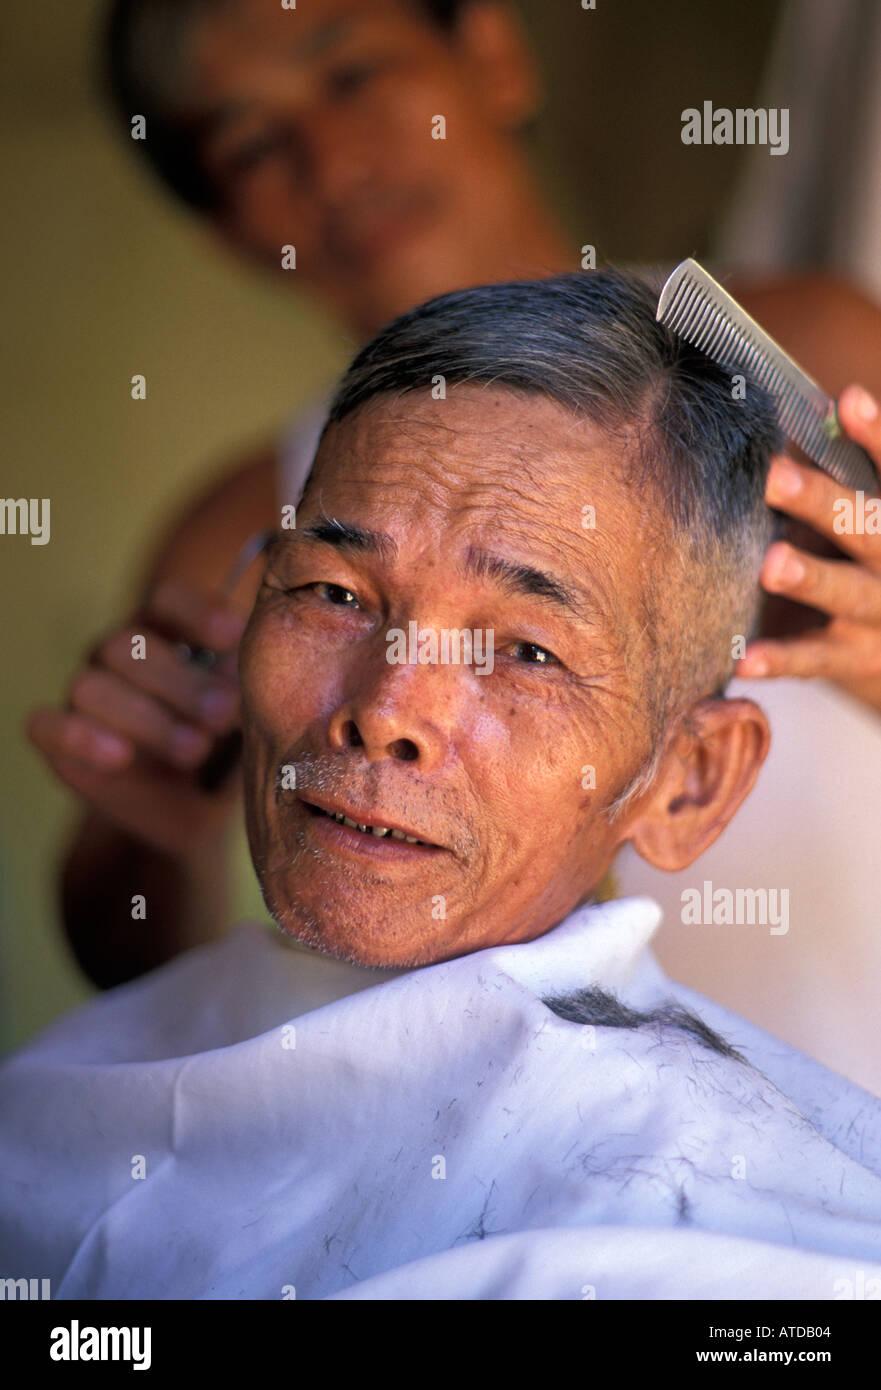 Vietnamese man getting his hair cut Local hairdressers on Ng Thi Minh Khai Street Hoi An Vietnam - Stock Image